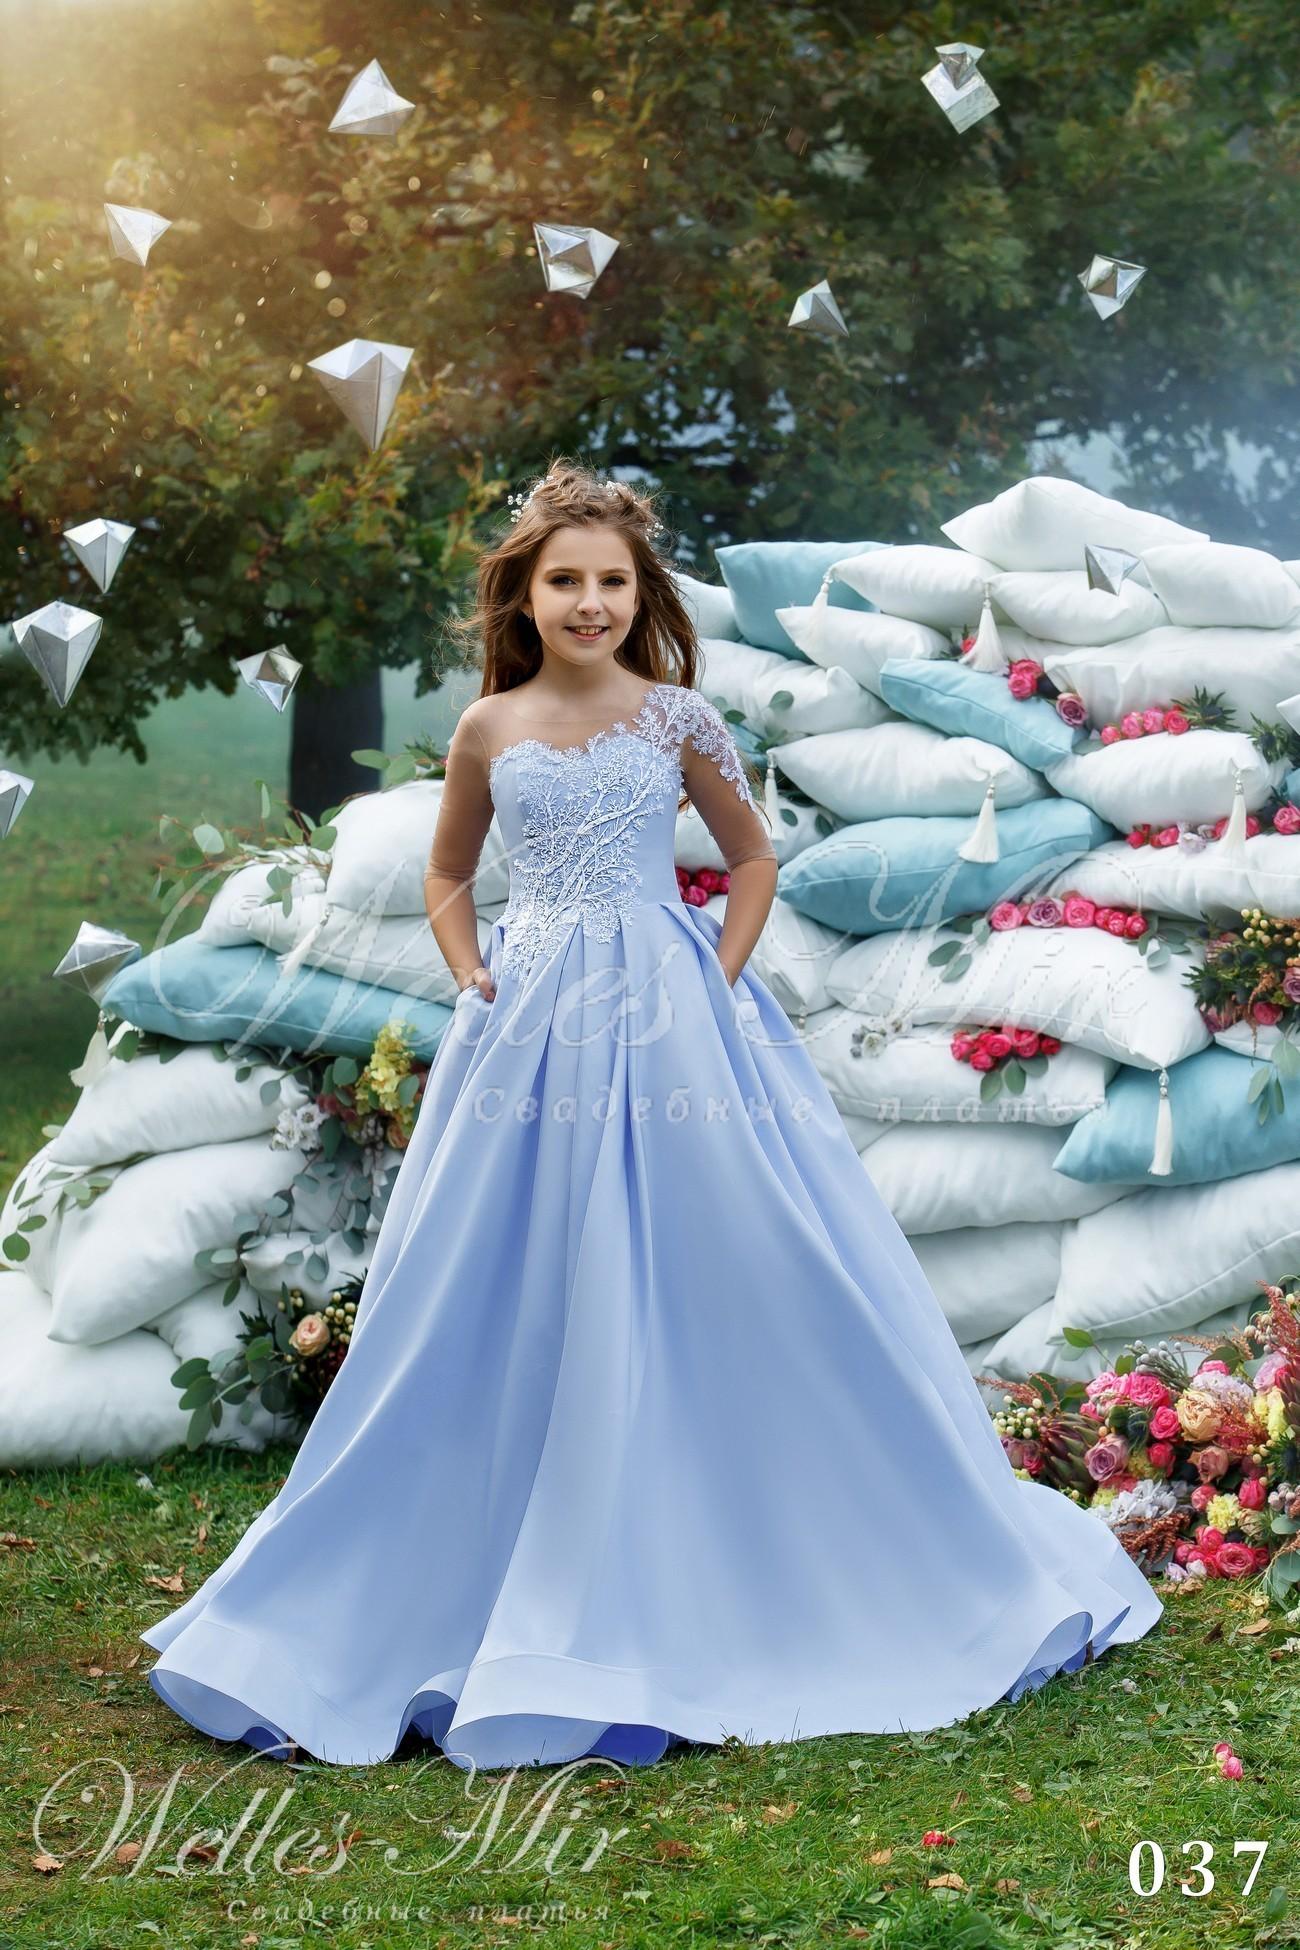 Детские платья Kids Deluxe Collection 2018 - 037